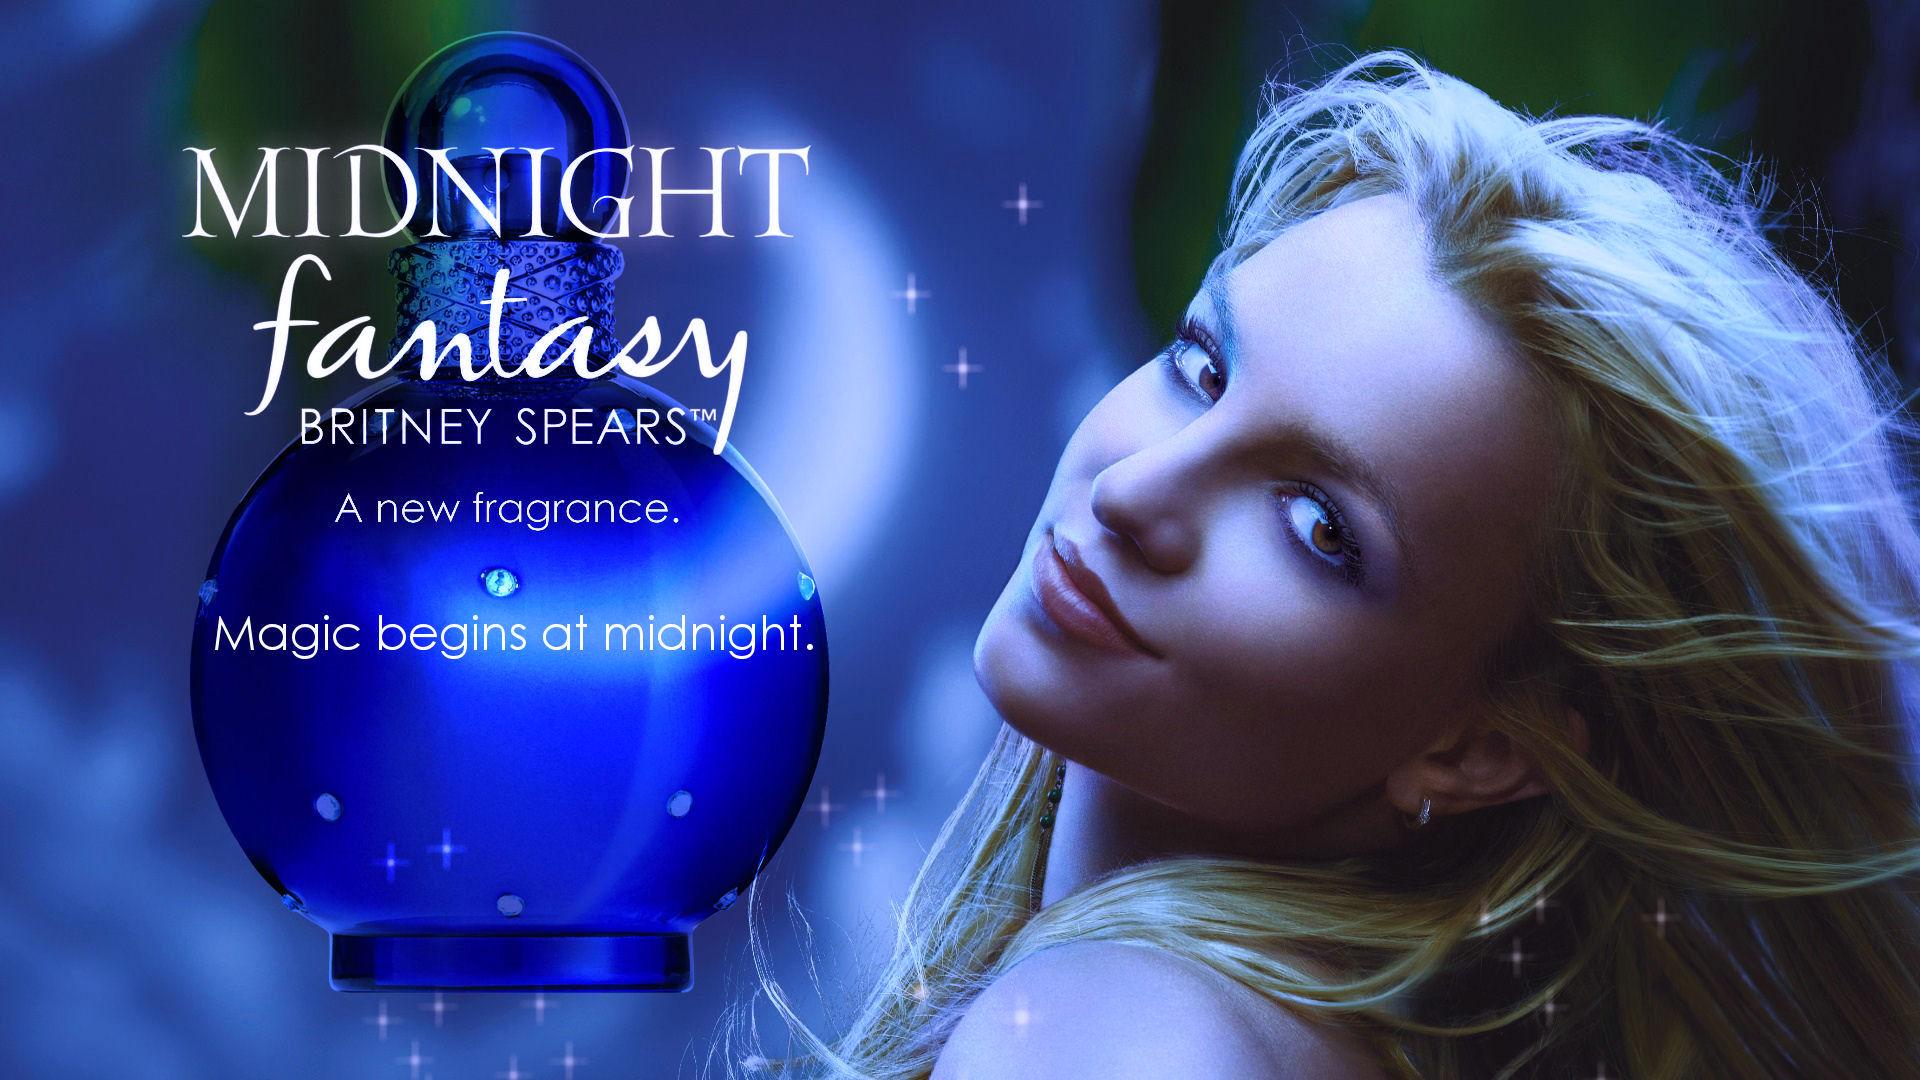 Britney Spears Fantasy Midnight EdP 50ml